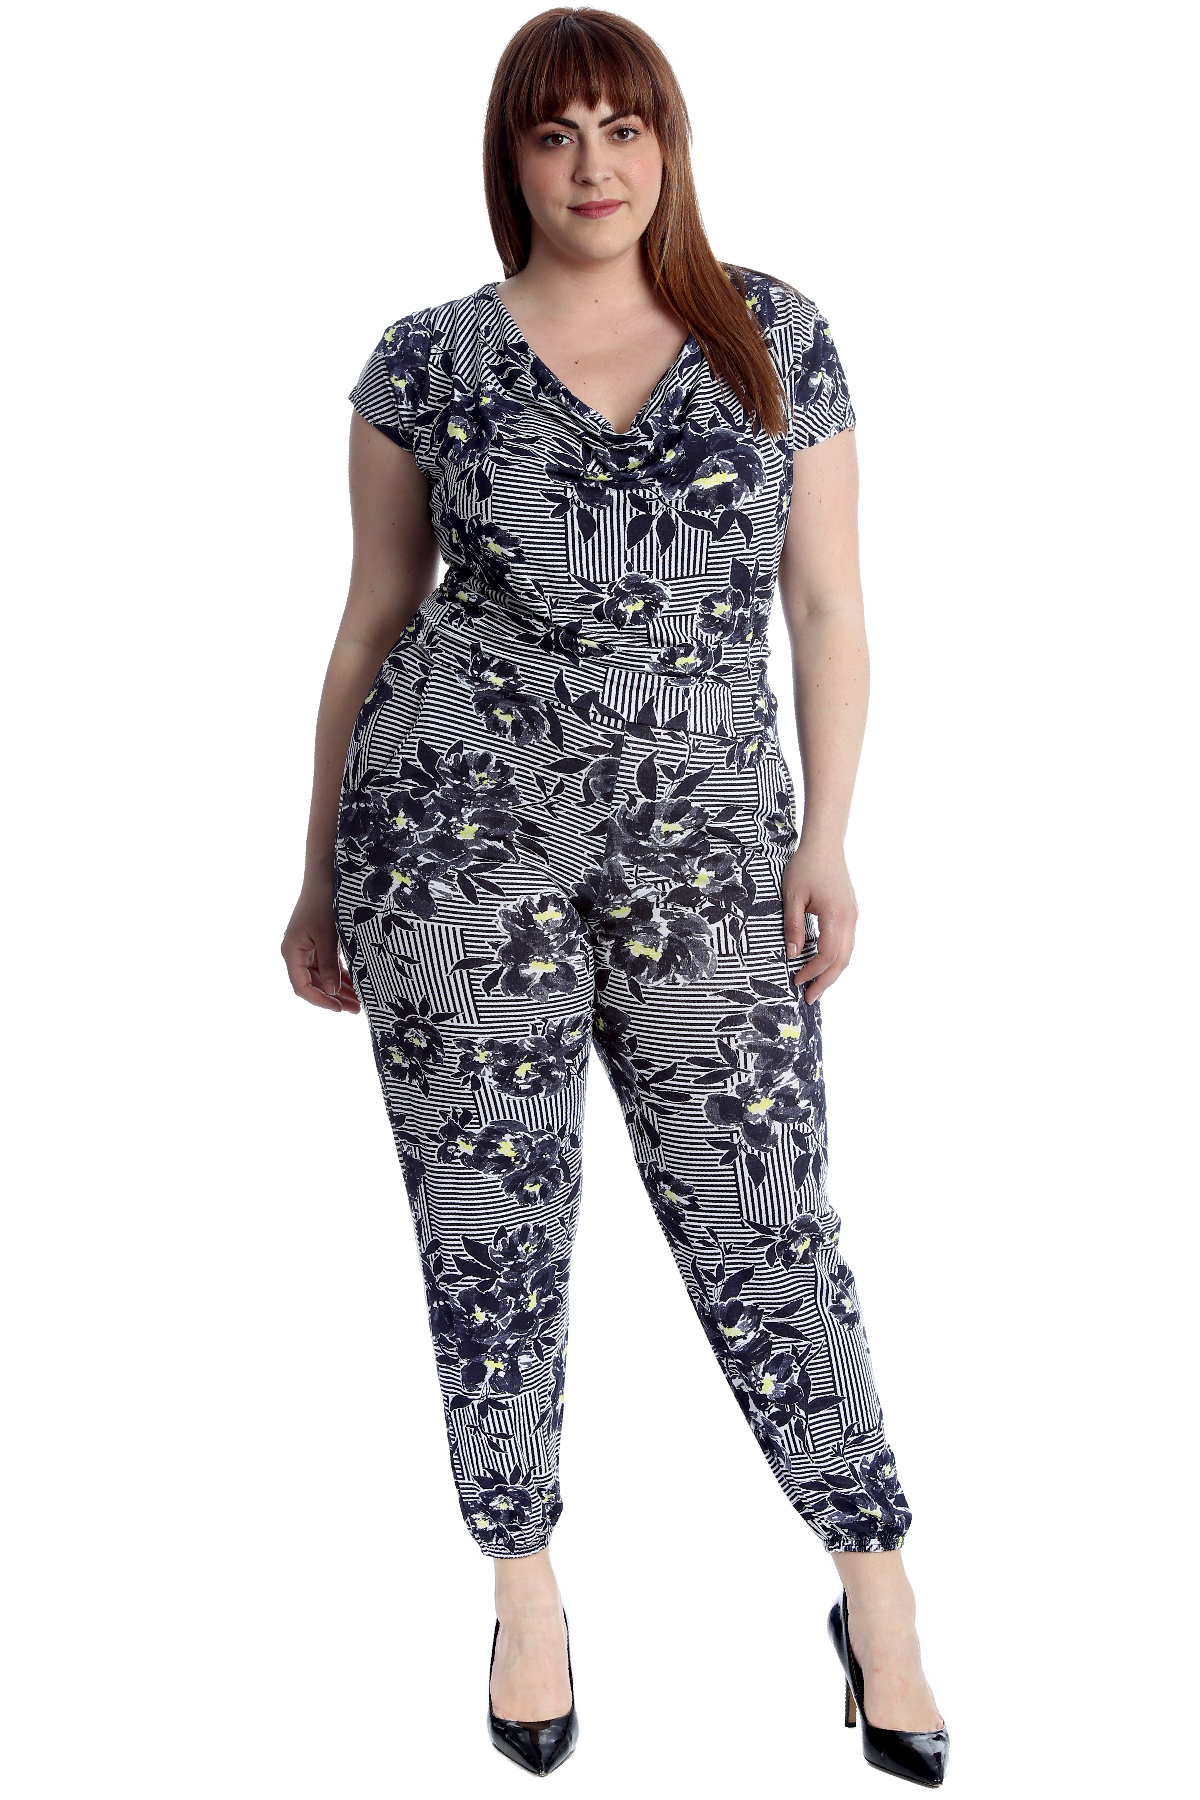 e937af2182 New Womens Plus Size Jumpsuit Ladies Floral Stripe Print Cap Sleeves ...